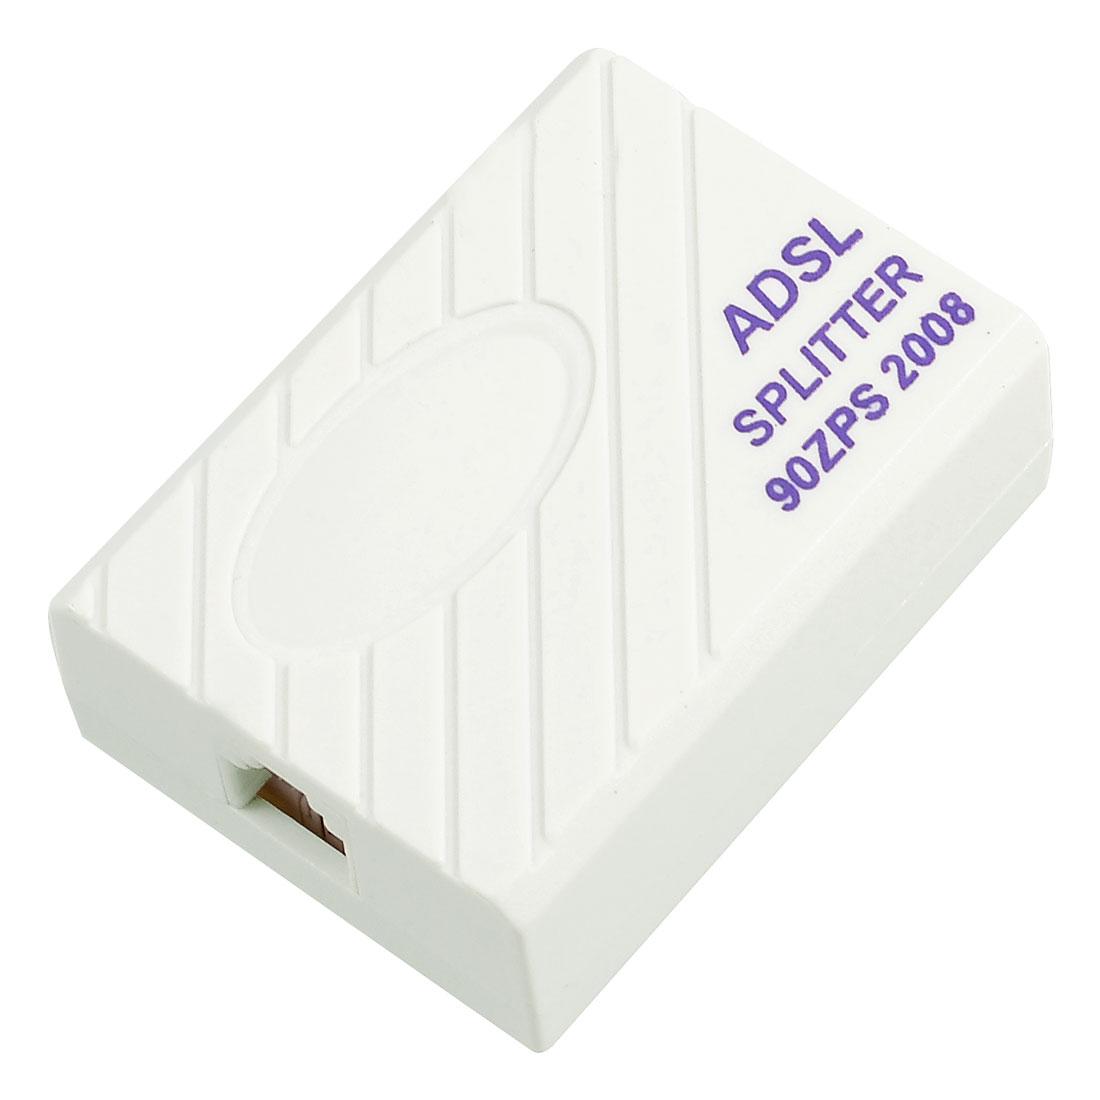 Telephone ADSL Modem 1 to 2 RJ11 6P2C Plug Splitter Filter